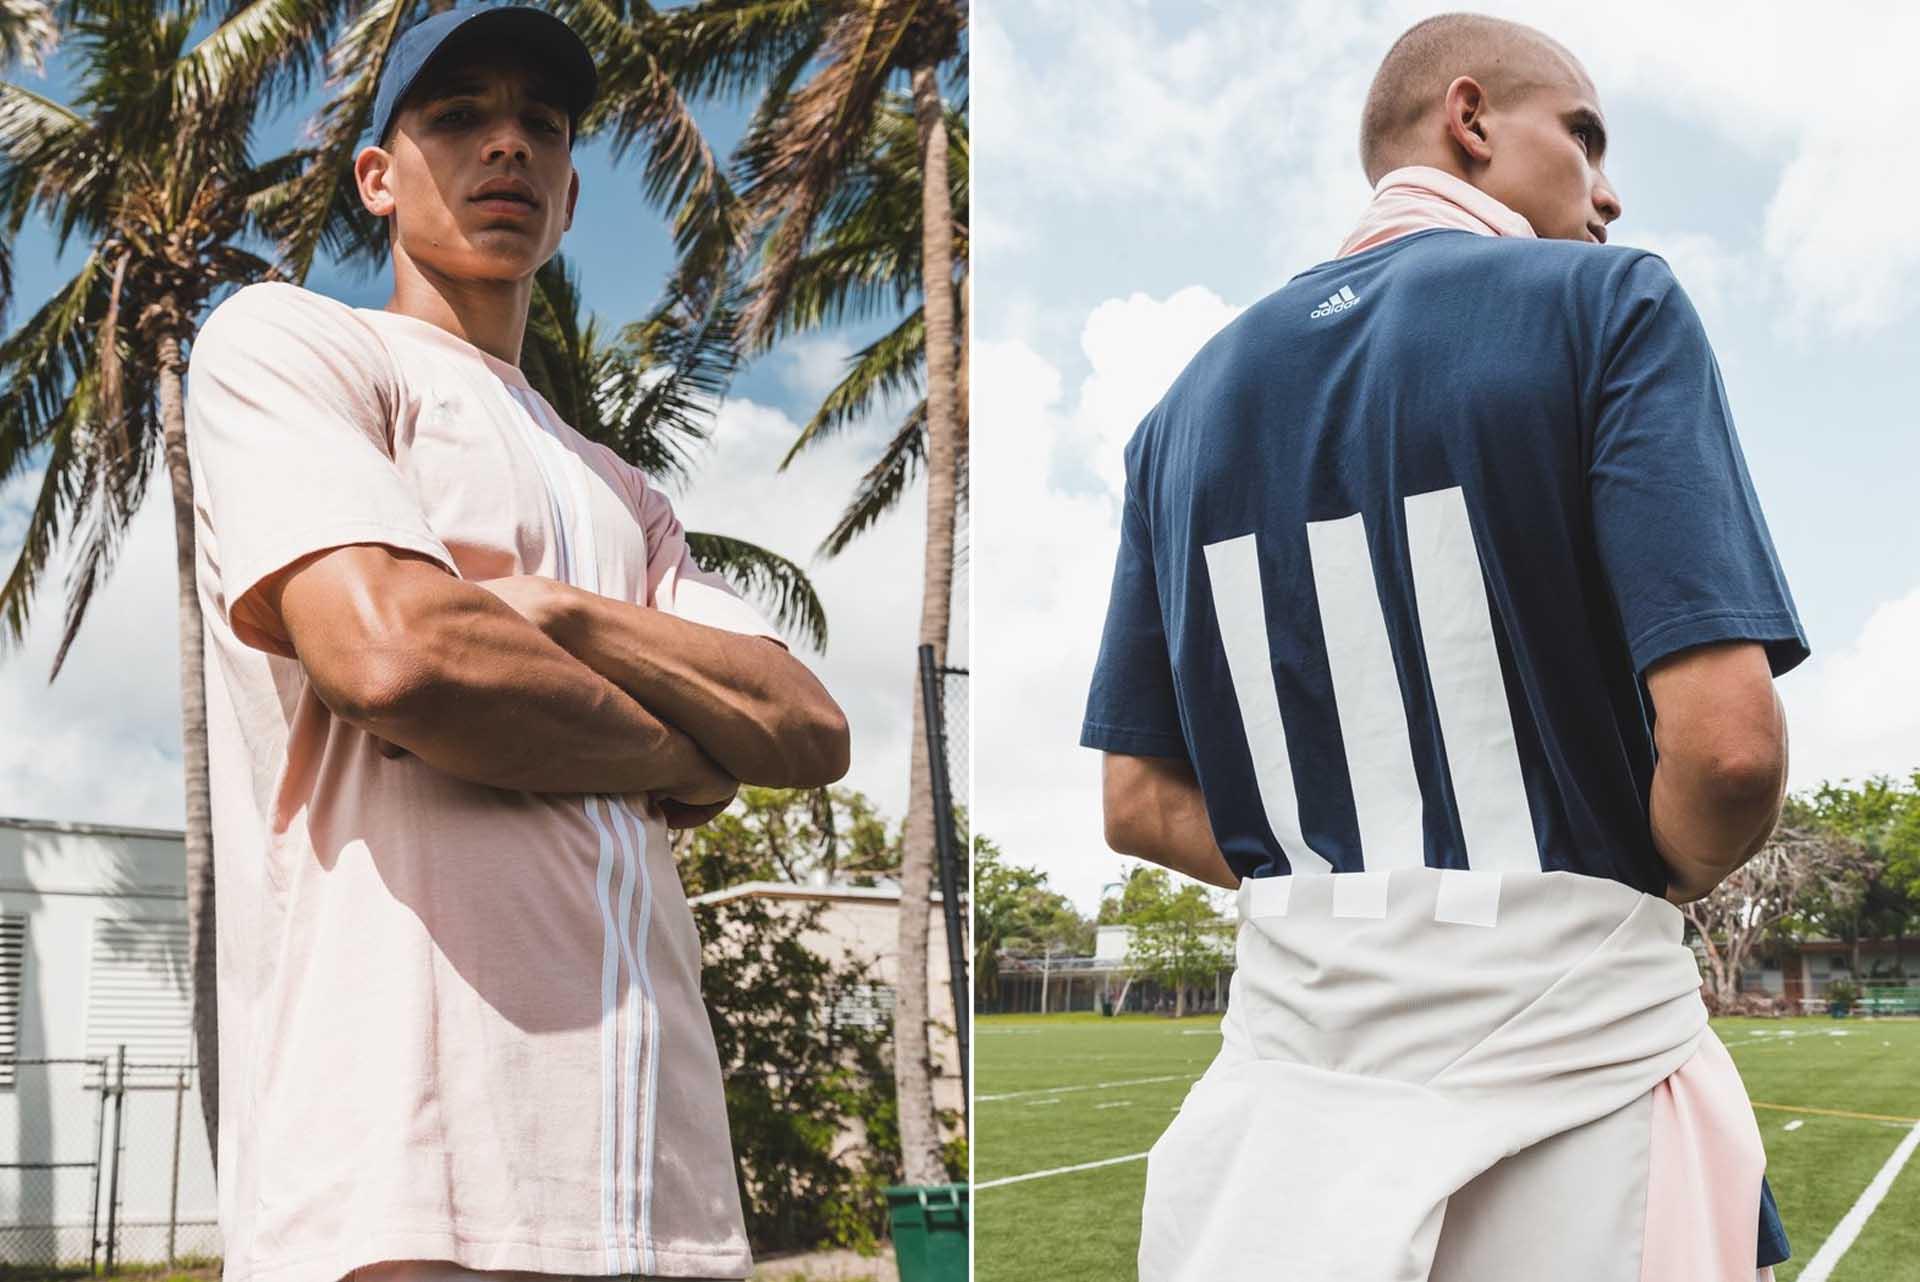 huge selection of 8bd11 558c2 KITH x adidas Football Miami Flamingos Lookbook - SoccerBible.